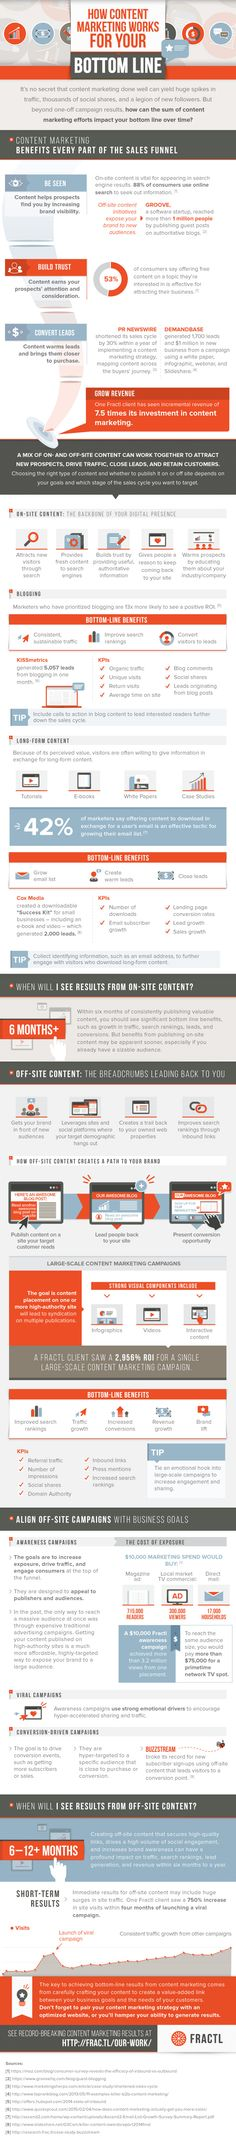 Infographie : le content marketing, comment ça marche ? How content marketing works for your bottom line